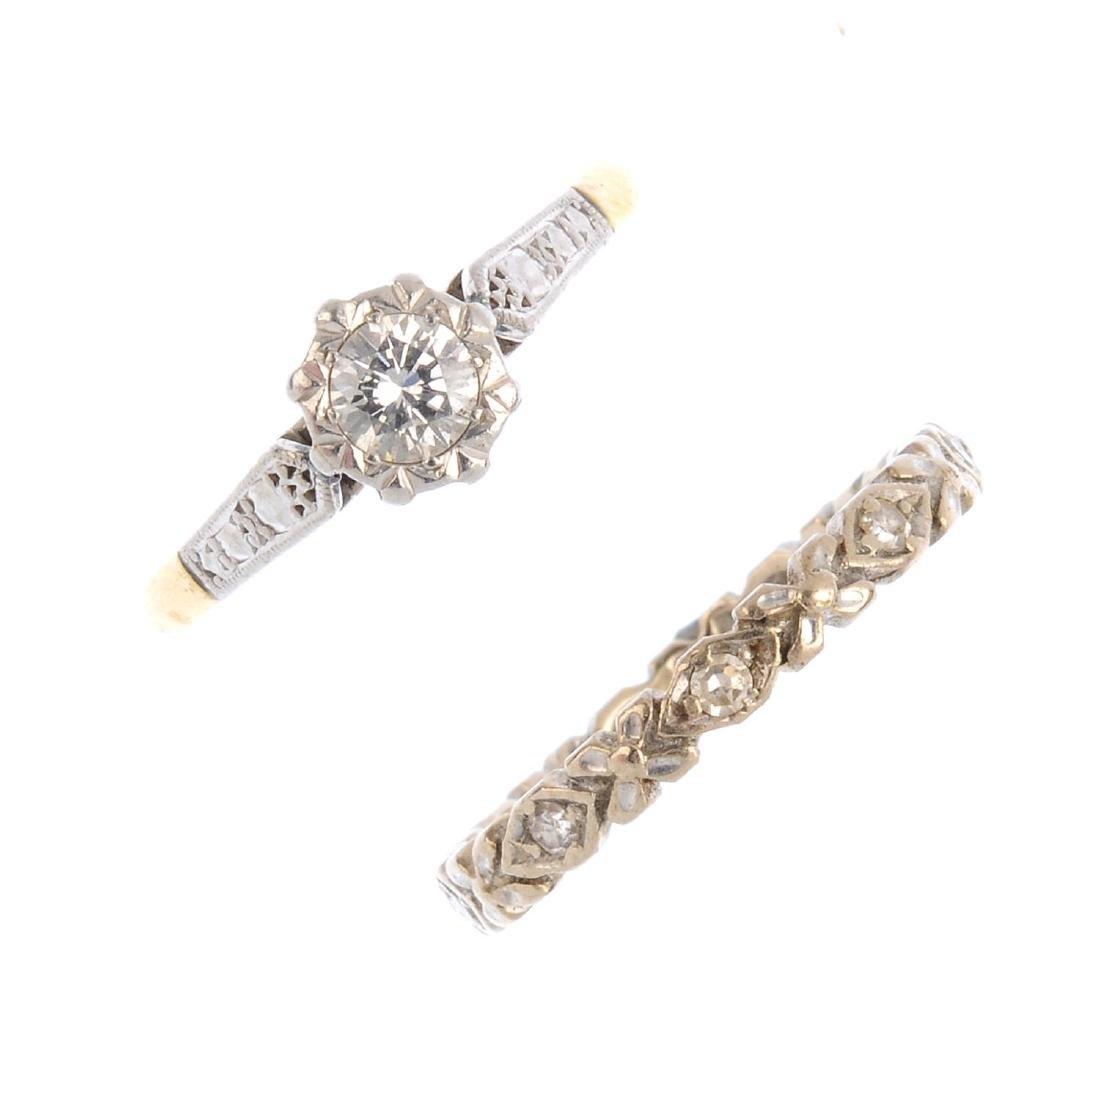 Two diamond rings. To include a single-cut diamond